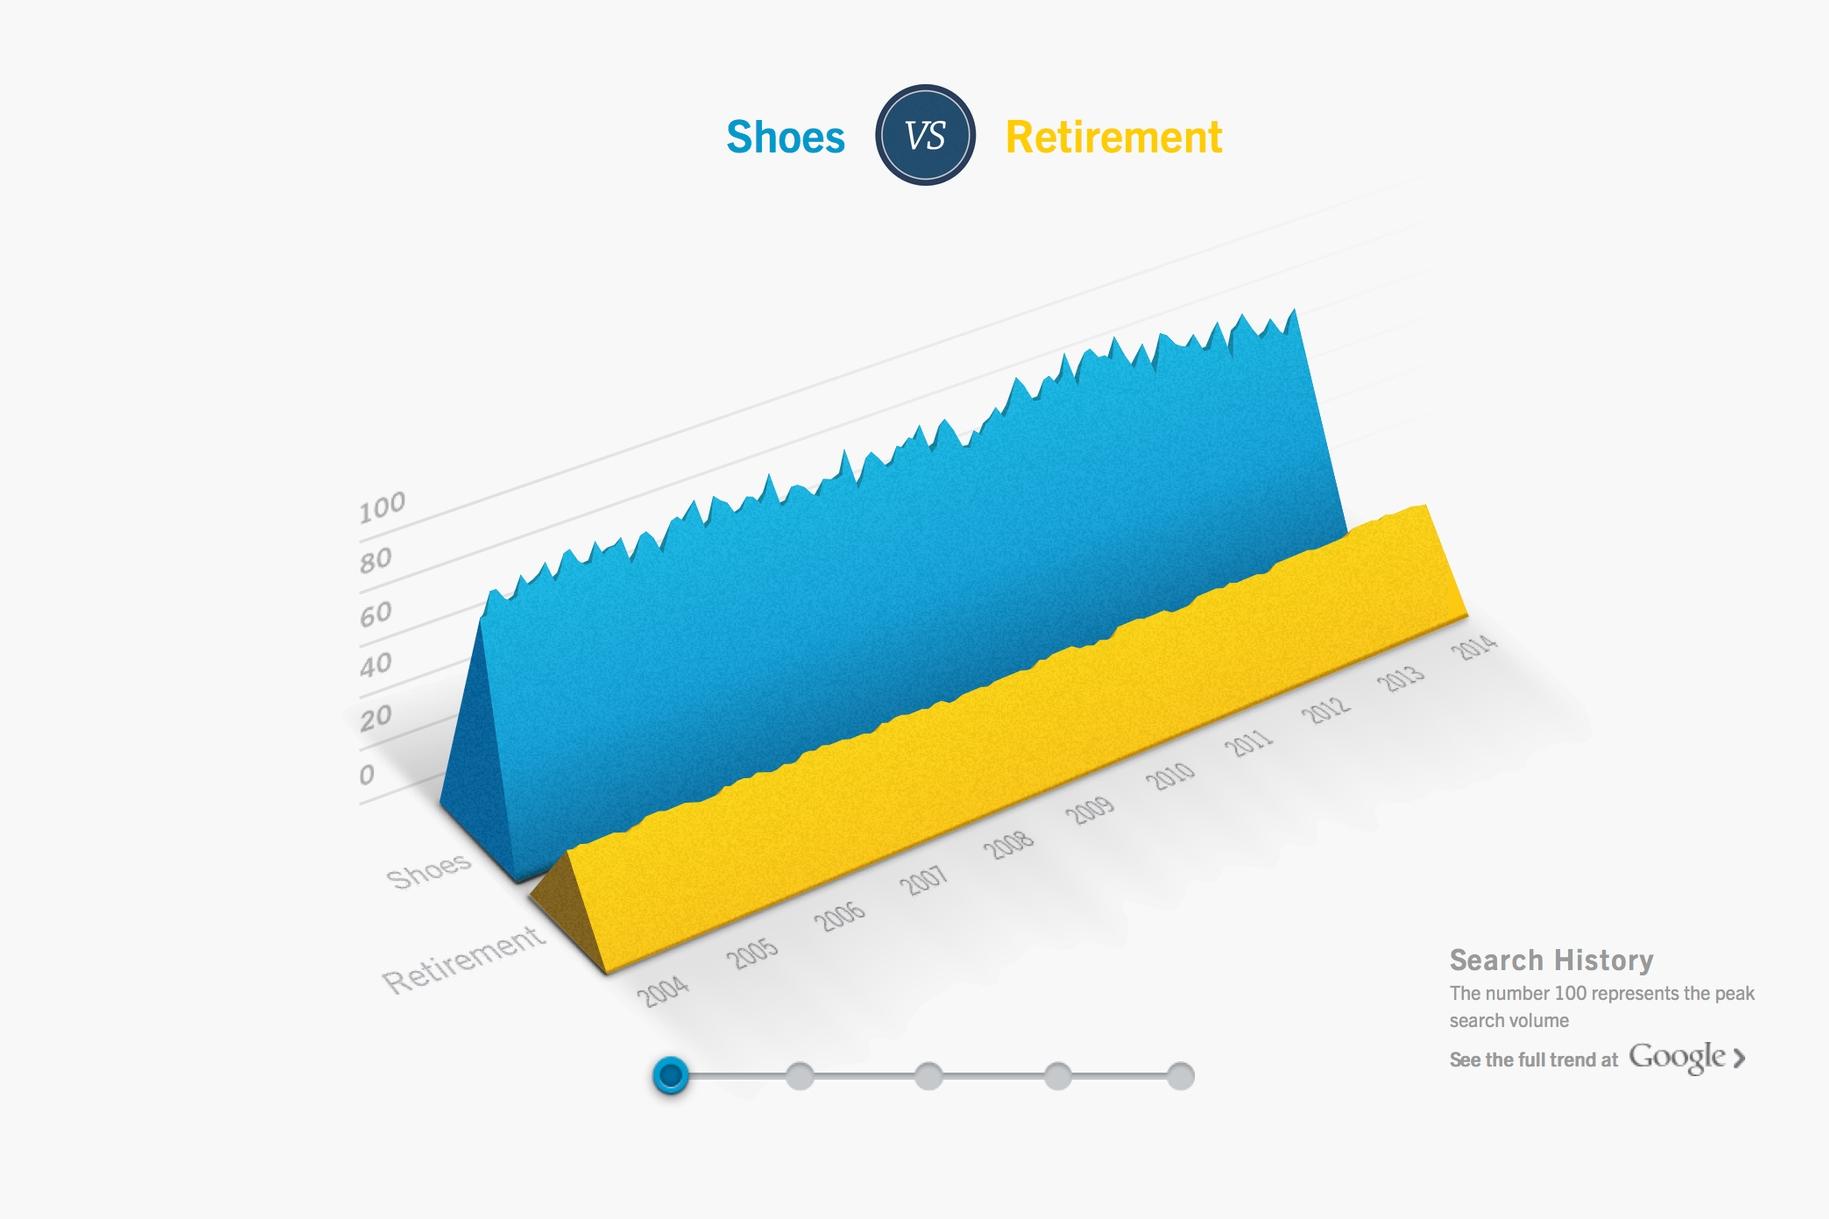 Google Trends_0000_Screen Shot 2016-04-02 at 1.14.45 PM.jpg